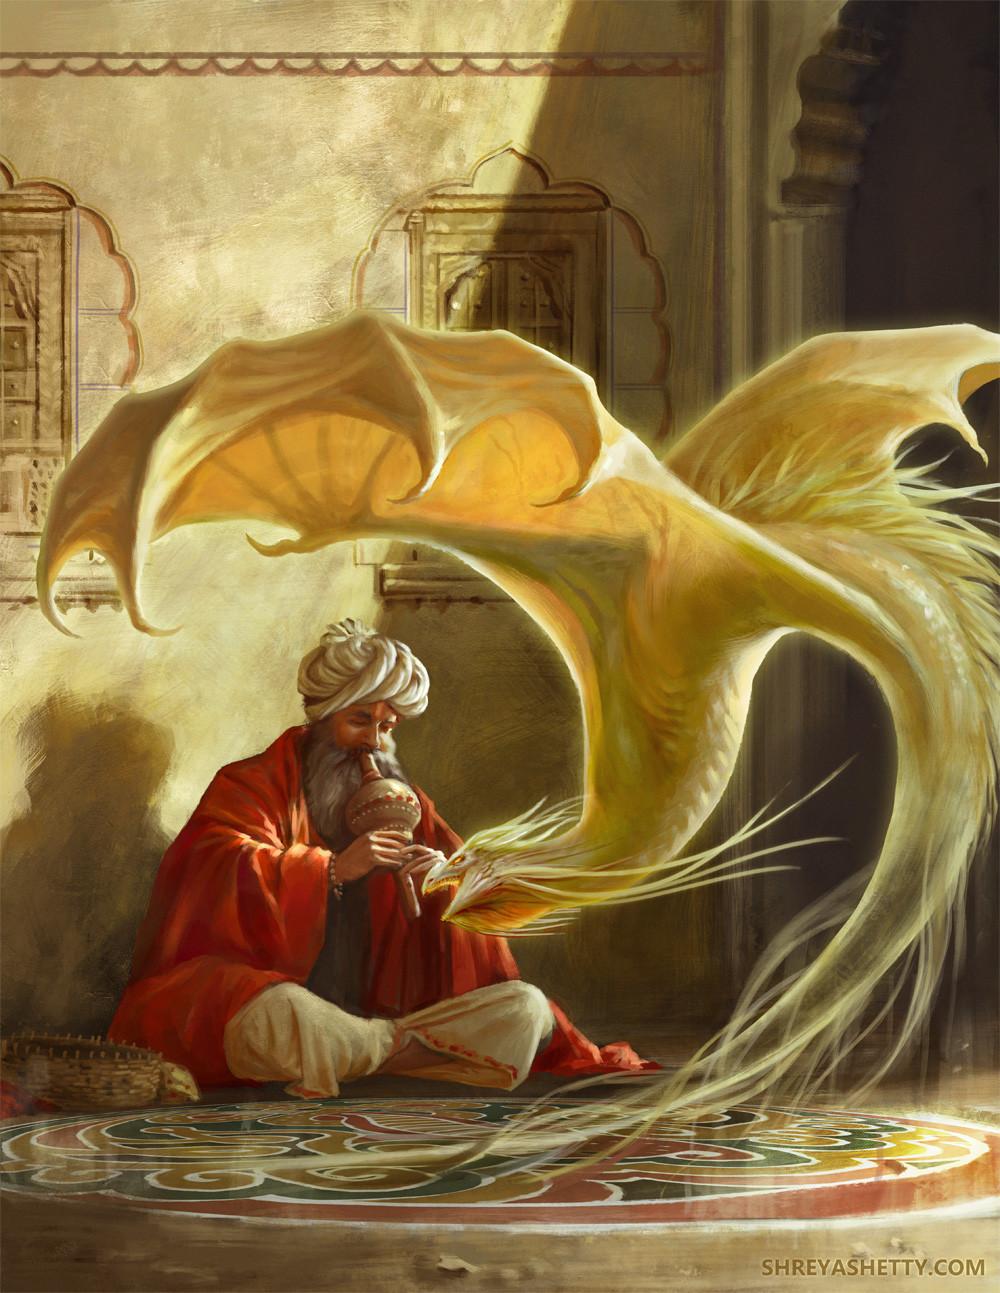 shreya-shetty-dragoncharmer.jpg